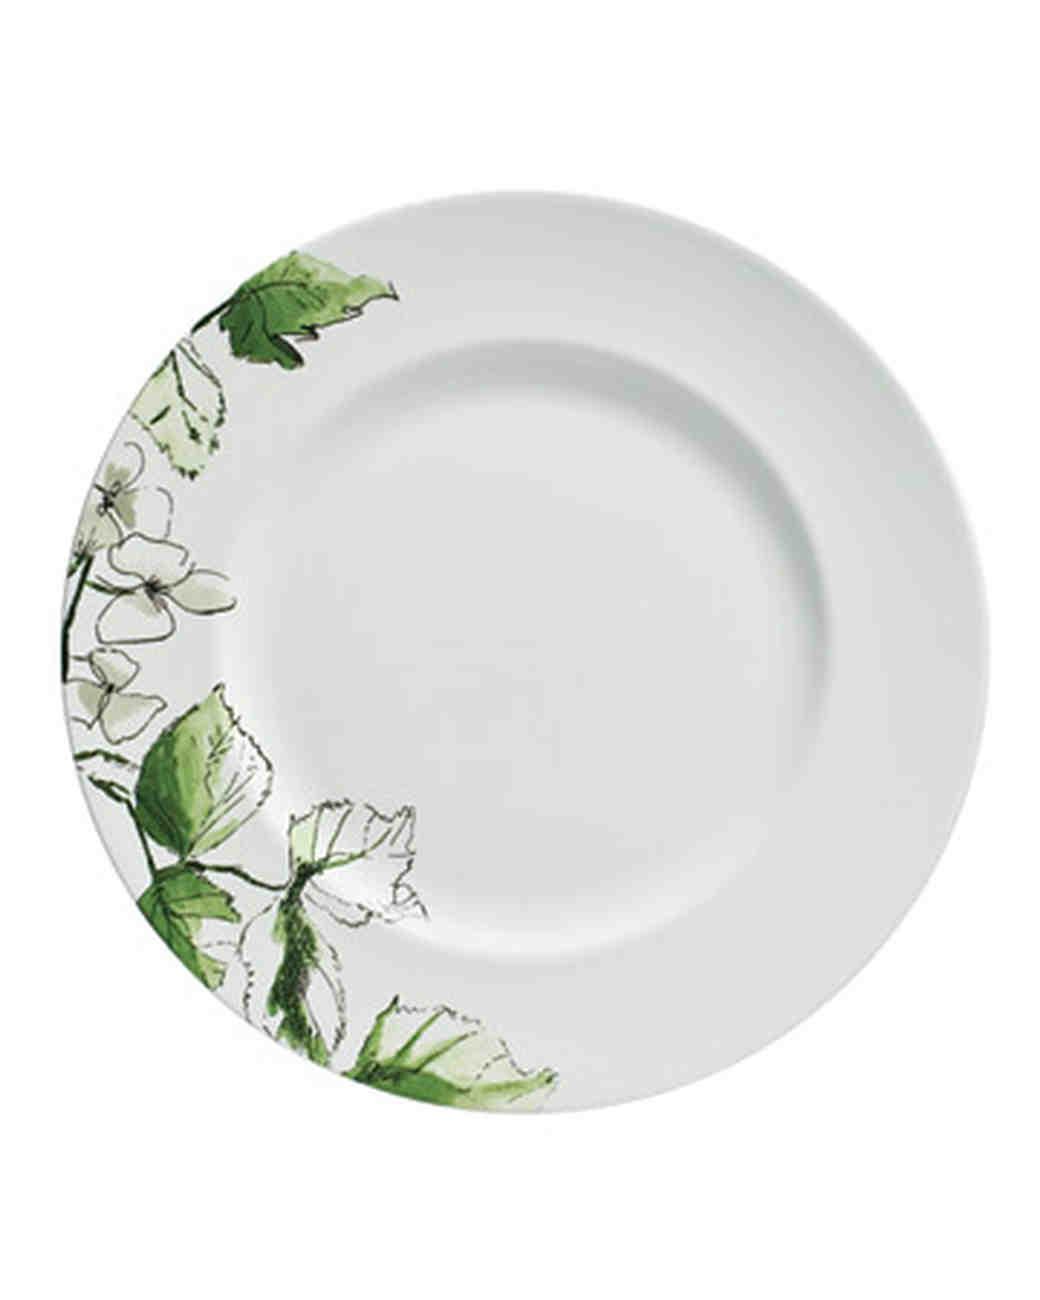 msw_sum10_vw_floral_leaf_dinner_plate.jpg